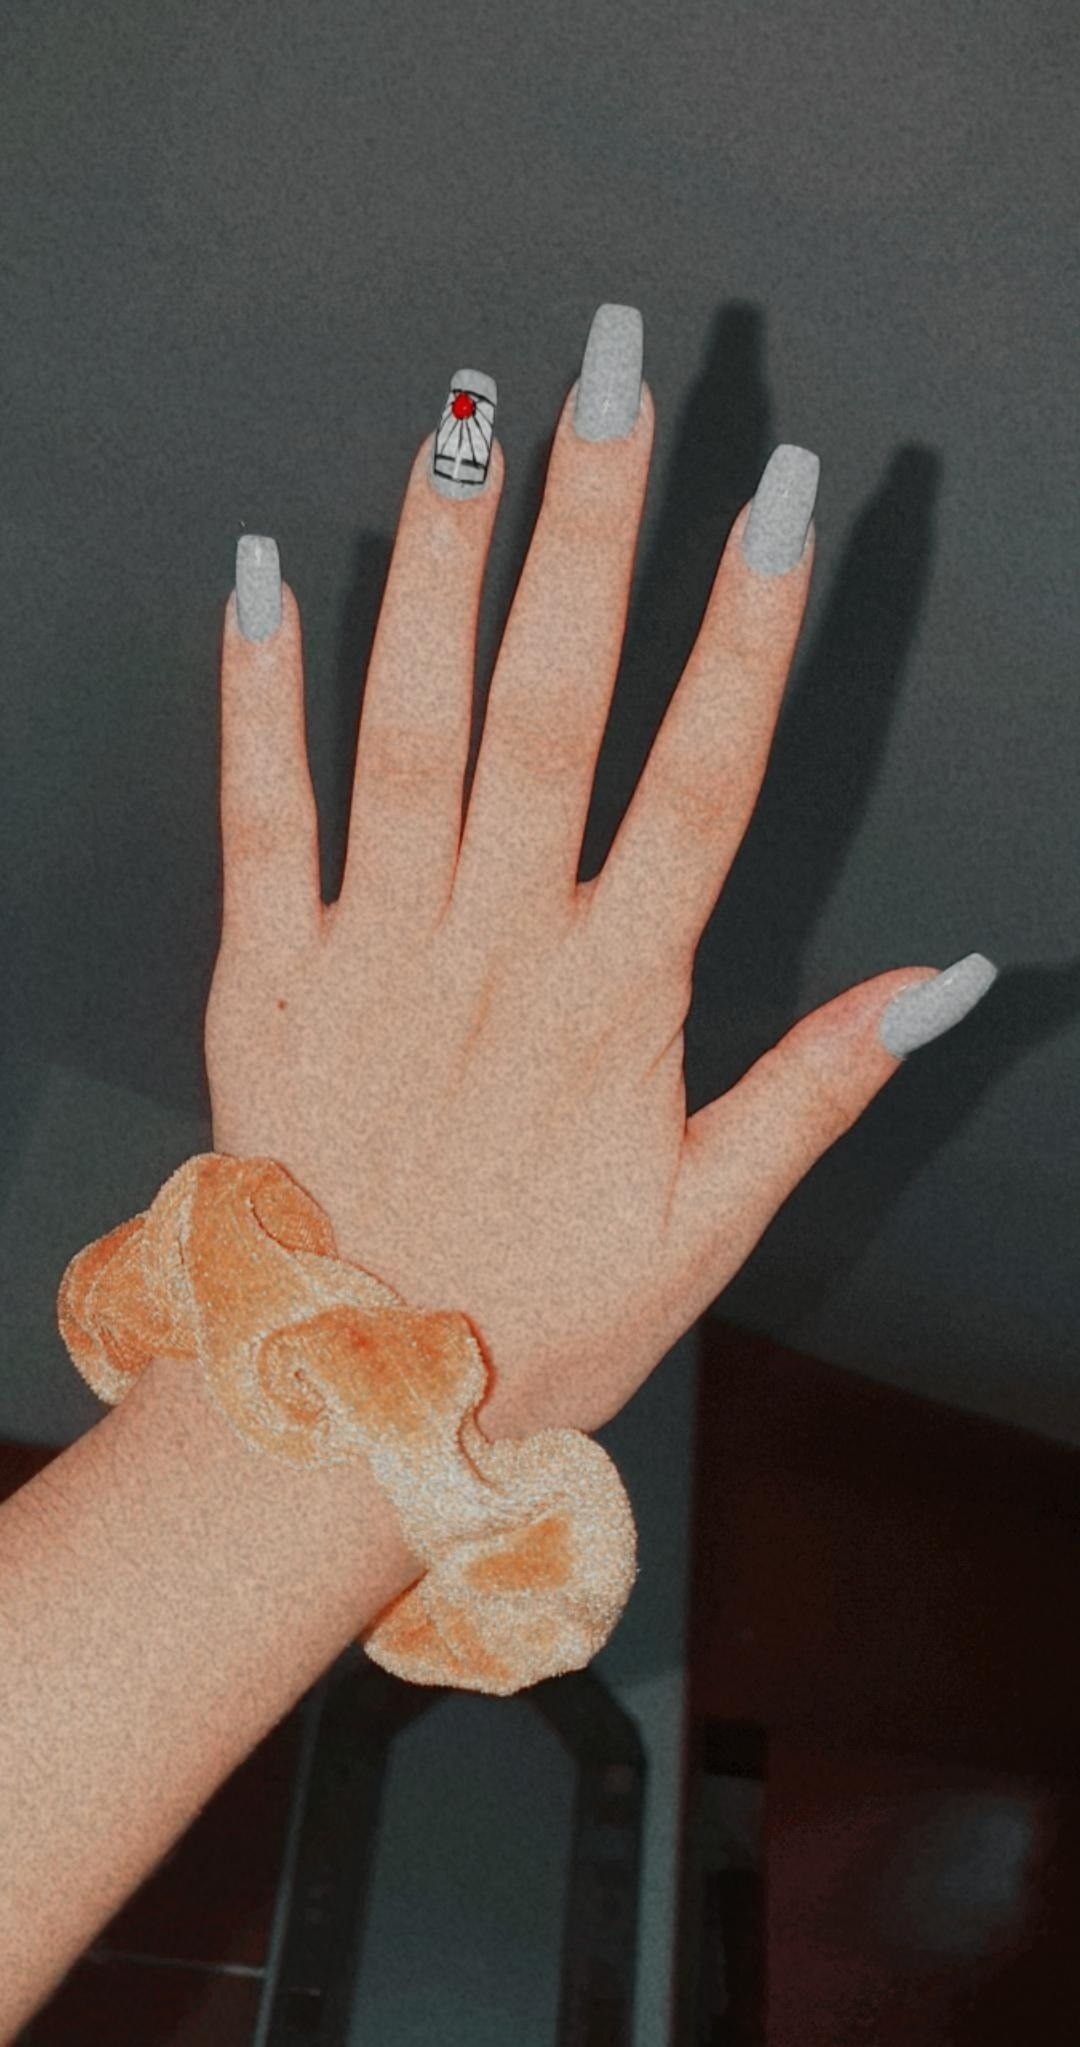 Kimetsu No Yaiba Nails Inspiration Anime Nails Short Acrylic Nails Designs Bling Acrylic Nails